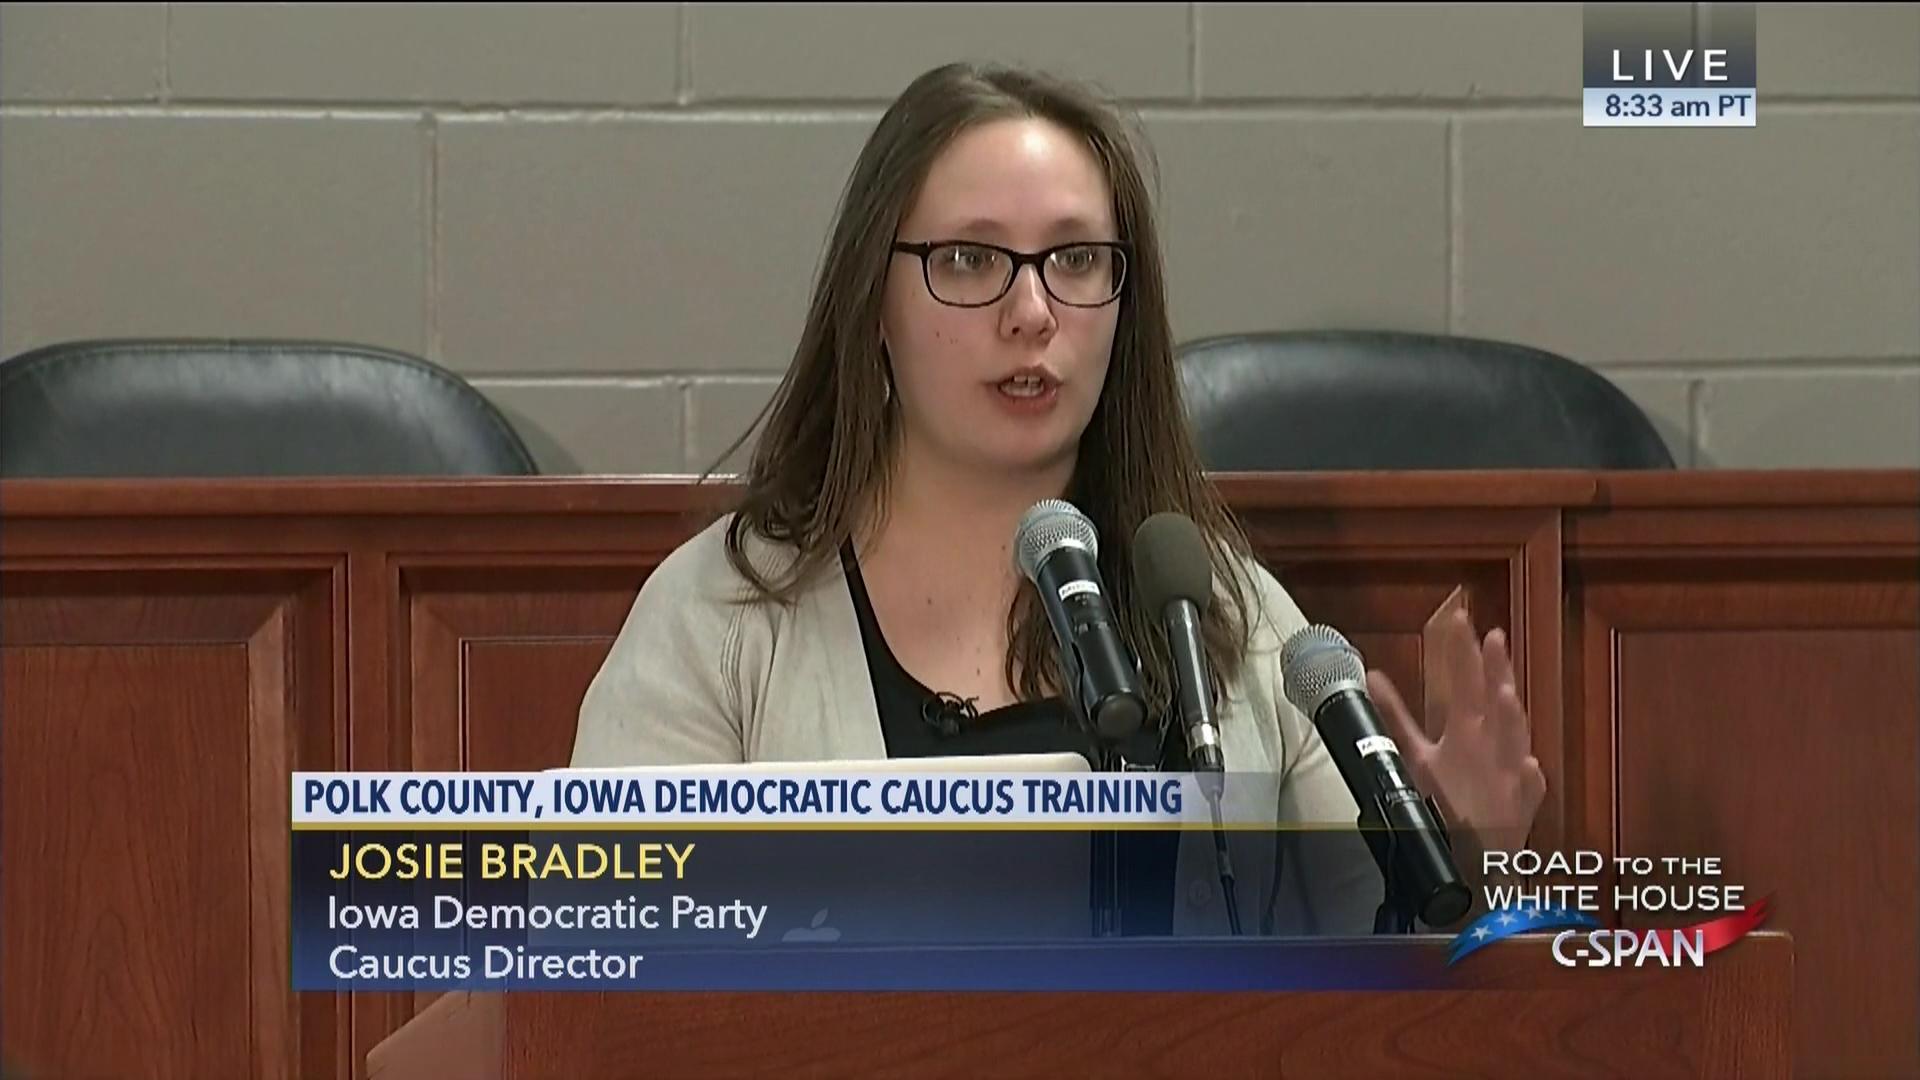 Polk County Iowa Democratic Caucus Training, Jan 30 2016   Video    C-SPAN.org